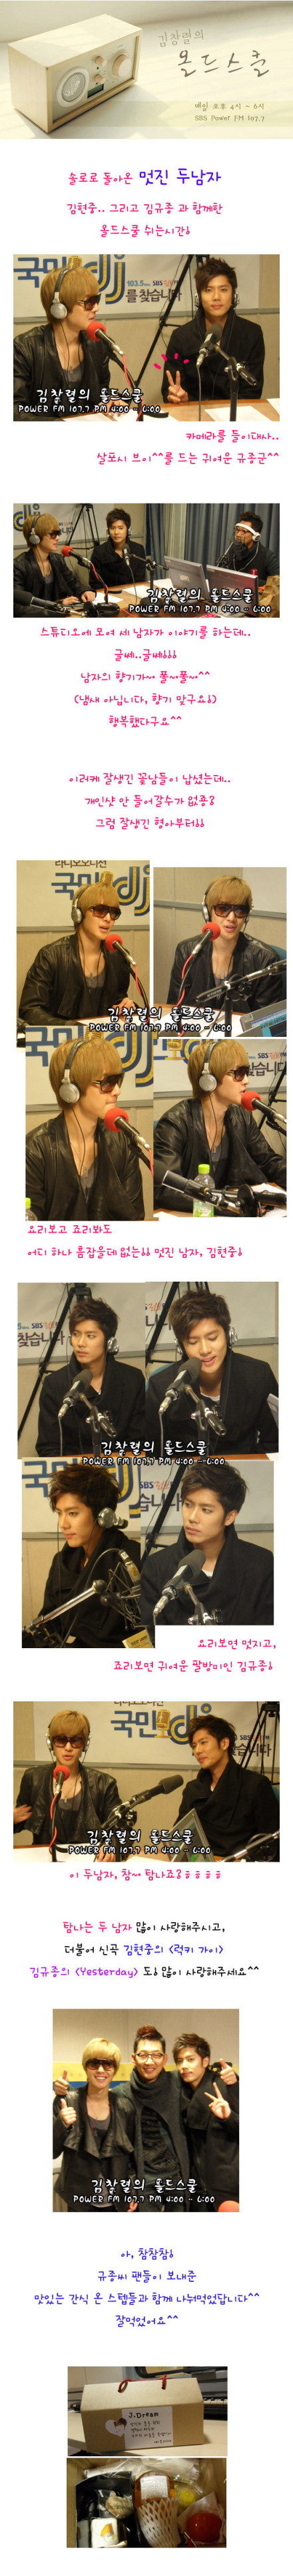 Kim Hyun Joong y Kyu Jong en Old School (24.10.11) Kyuhyung1077